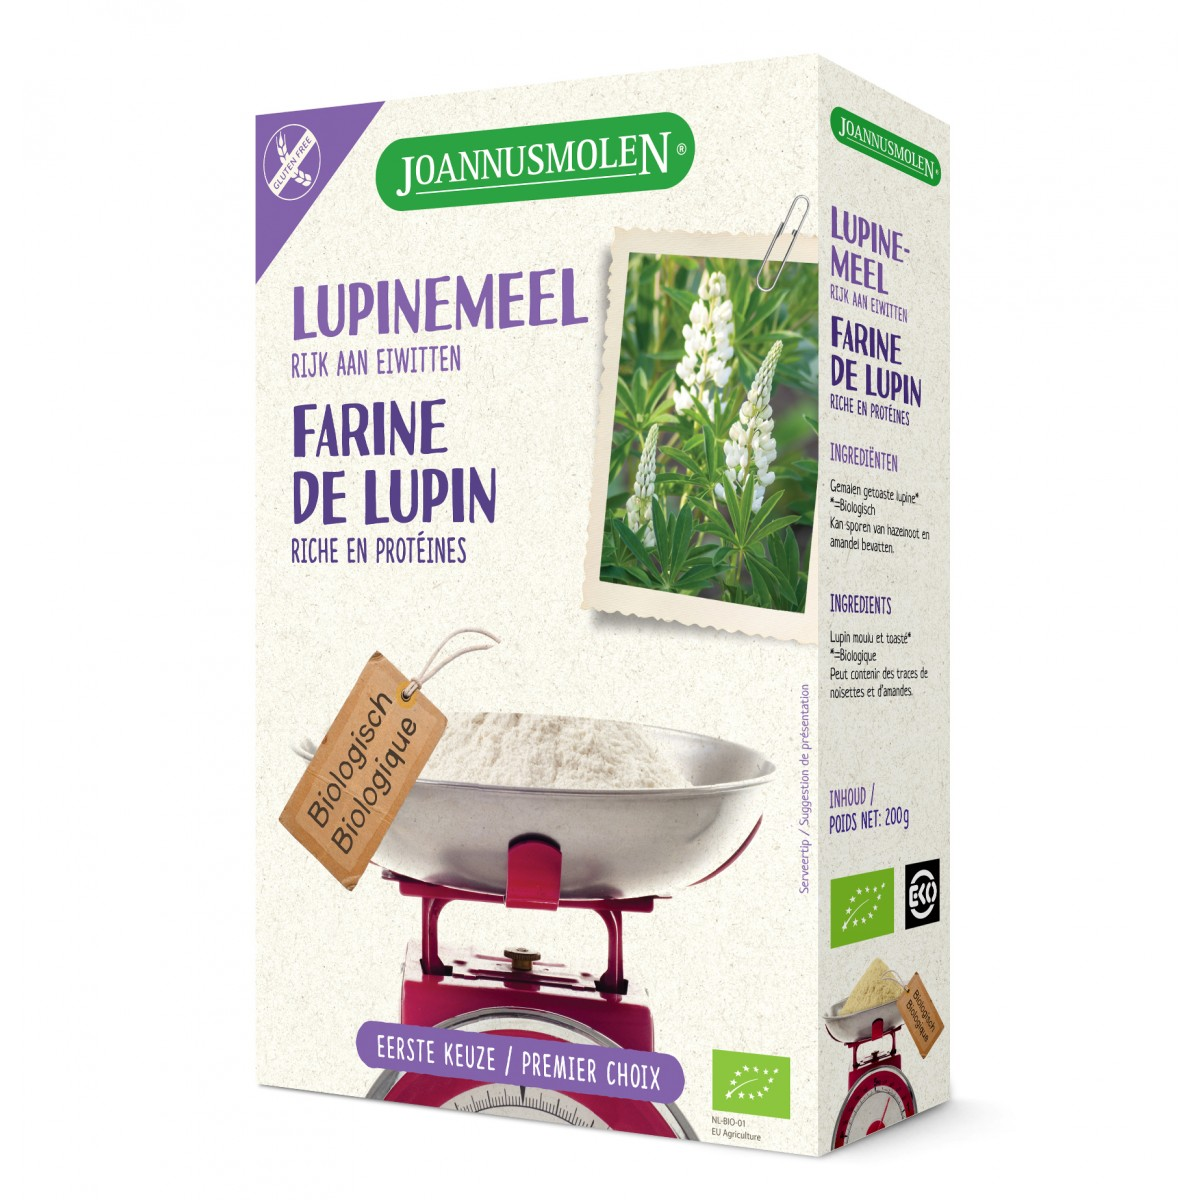 Lupinemeel